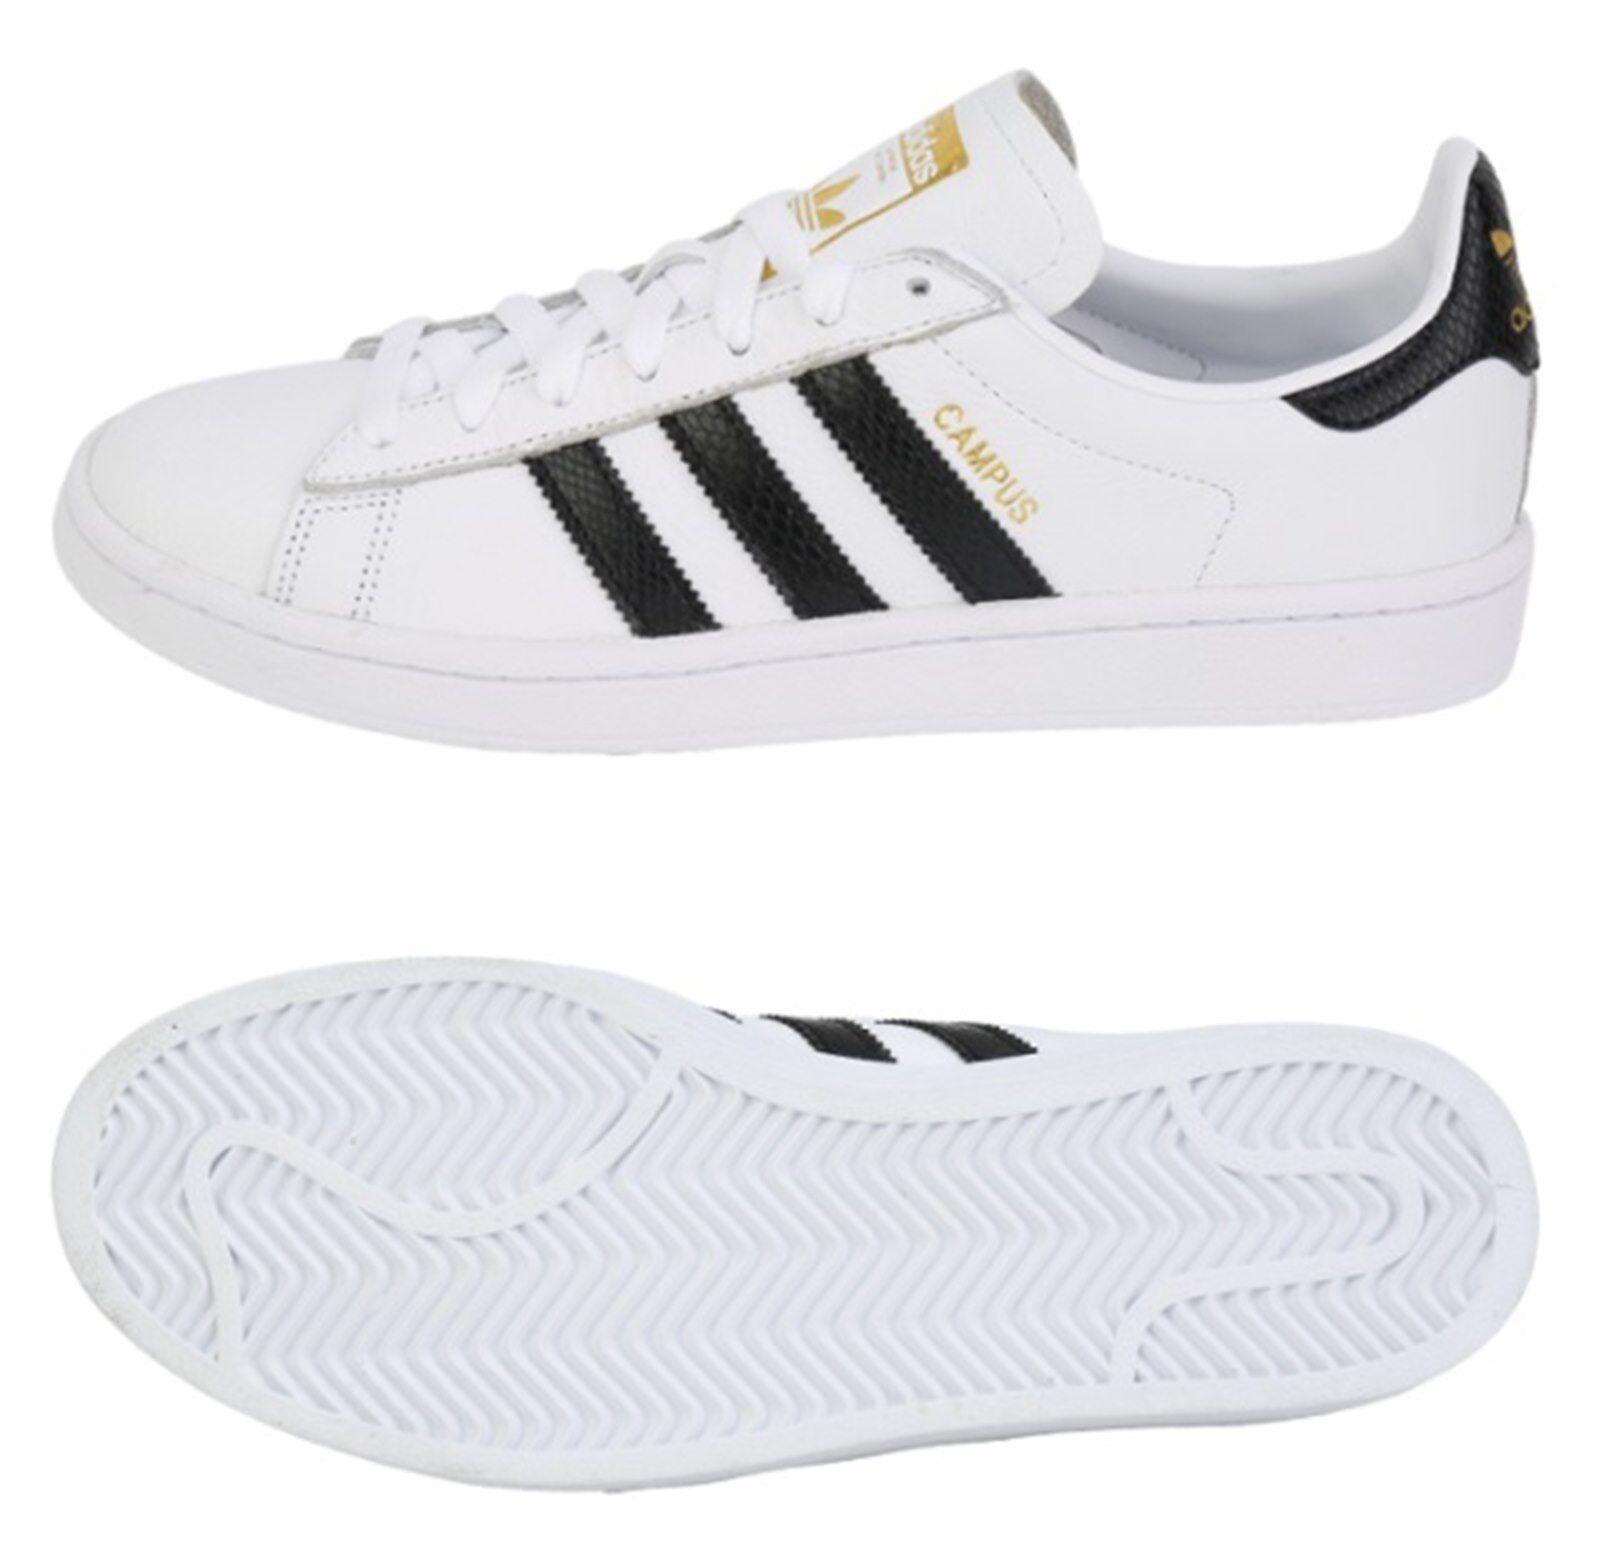 Adidas Men Originals Camus Training schuhe Running Weiß Turnschuhe schuhe CQ2074